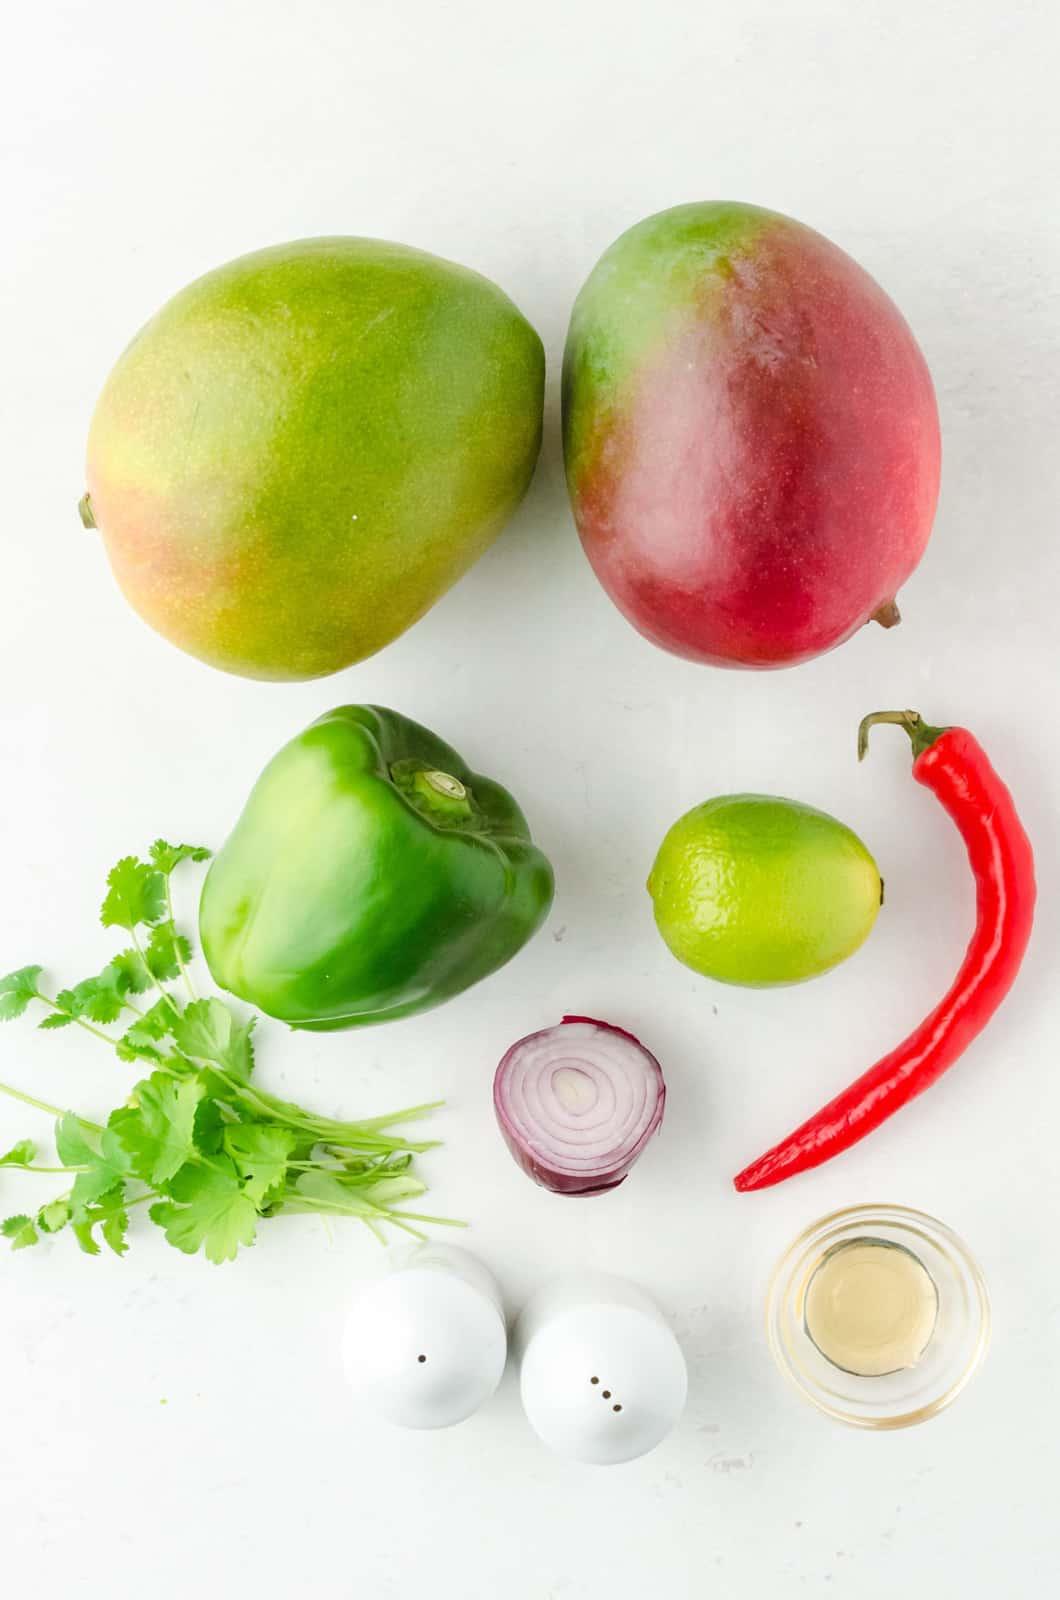 Ingredients needed to make Mango Salsa